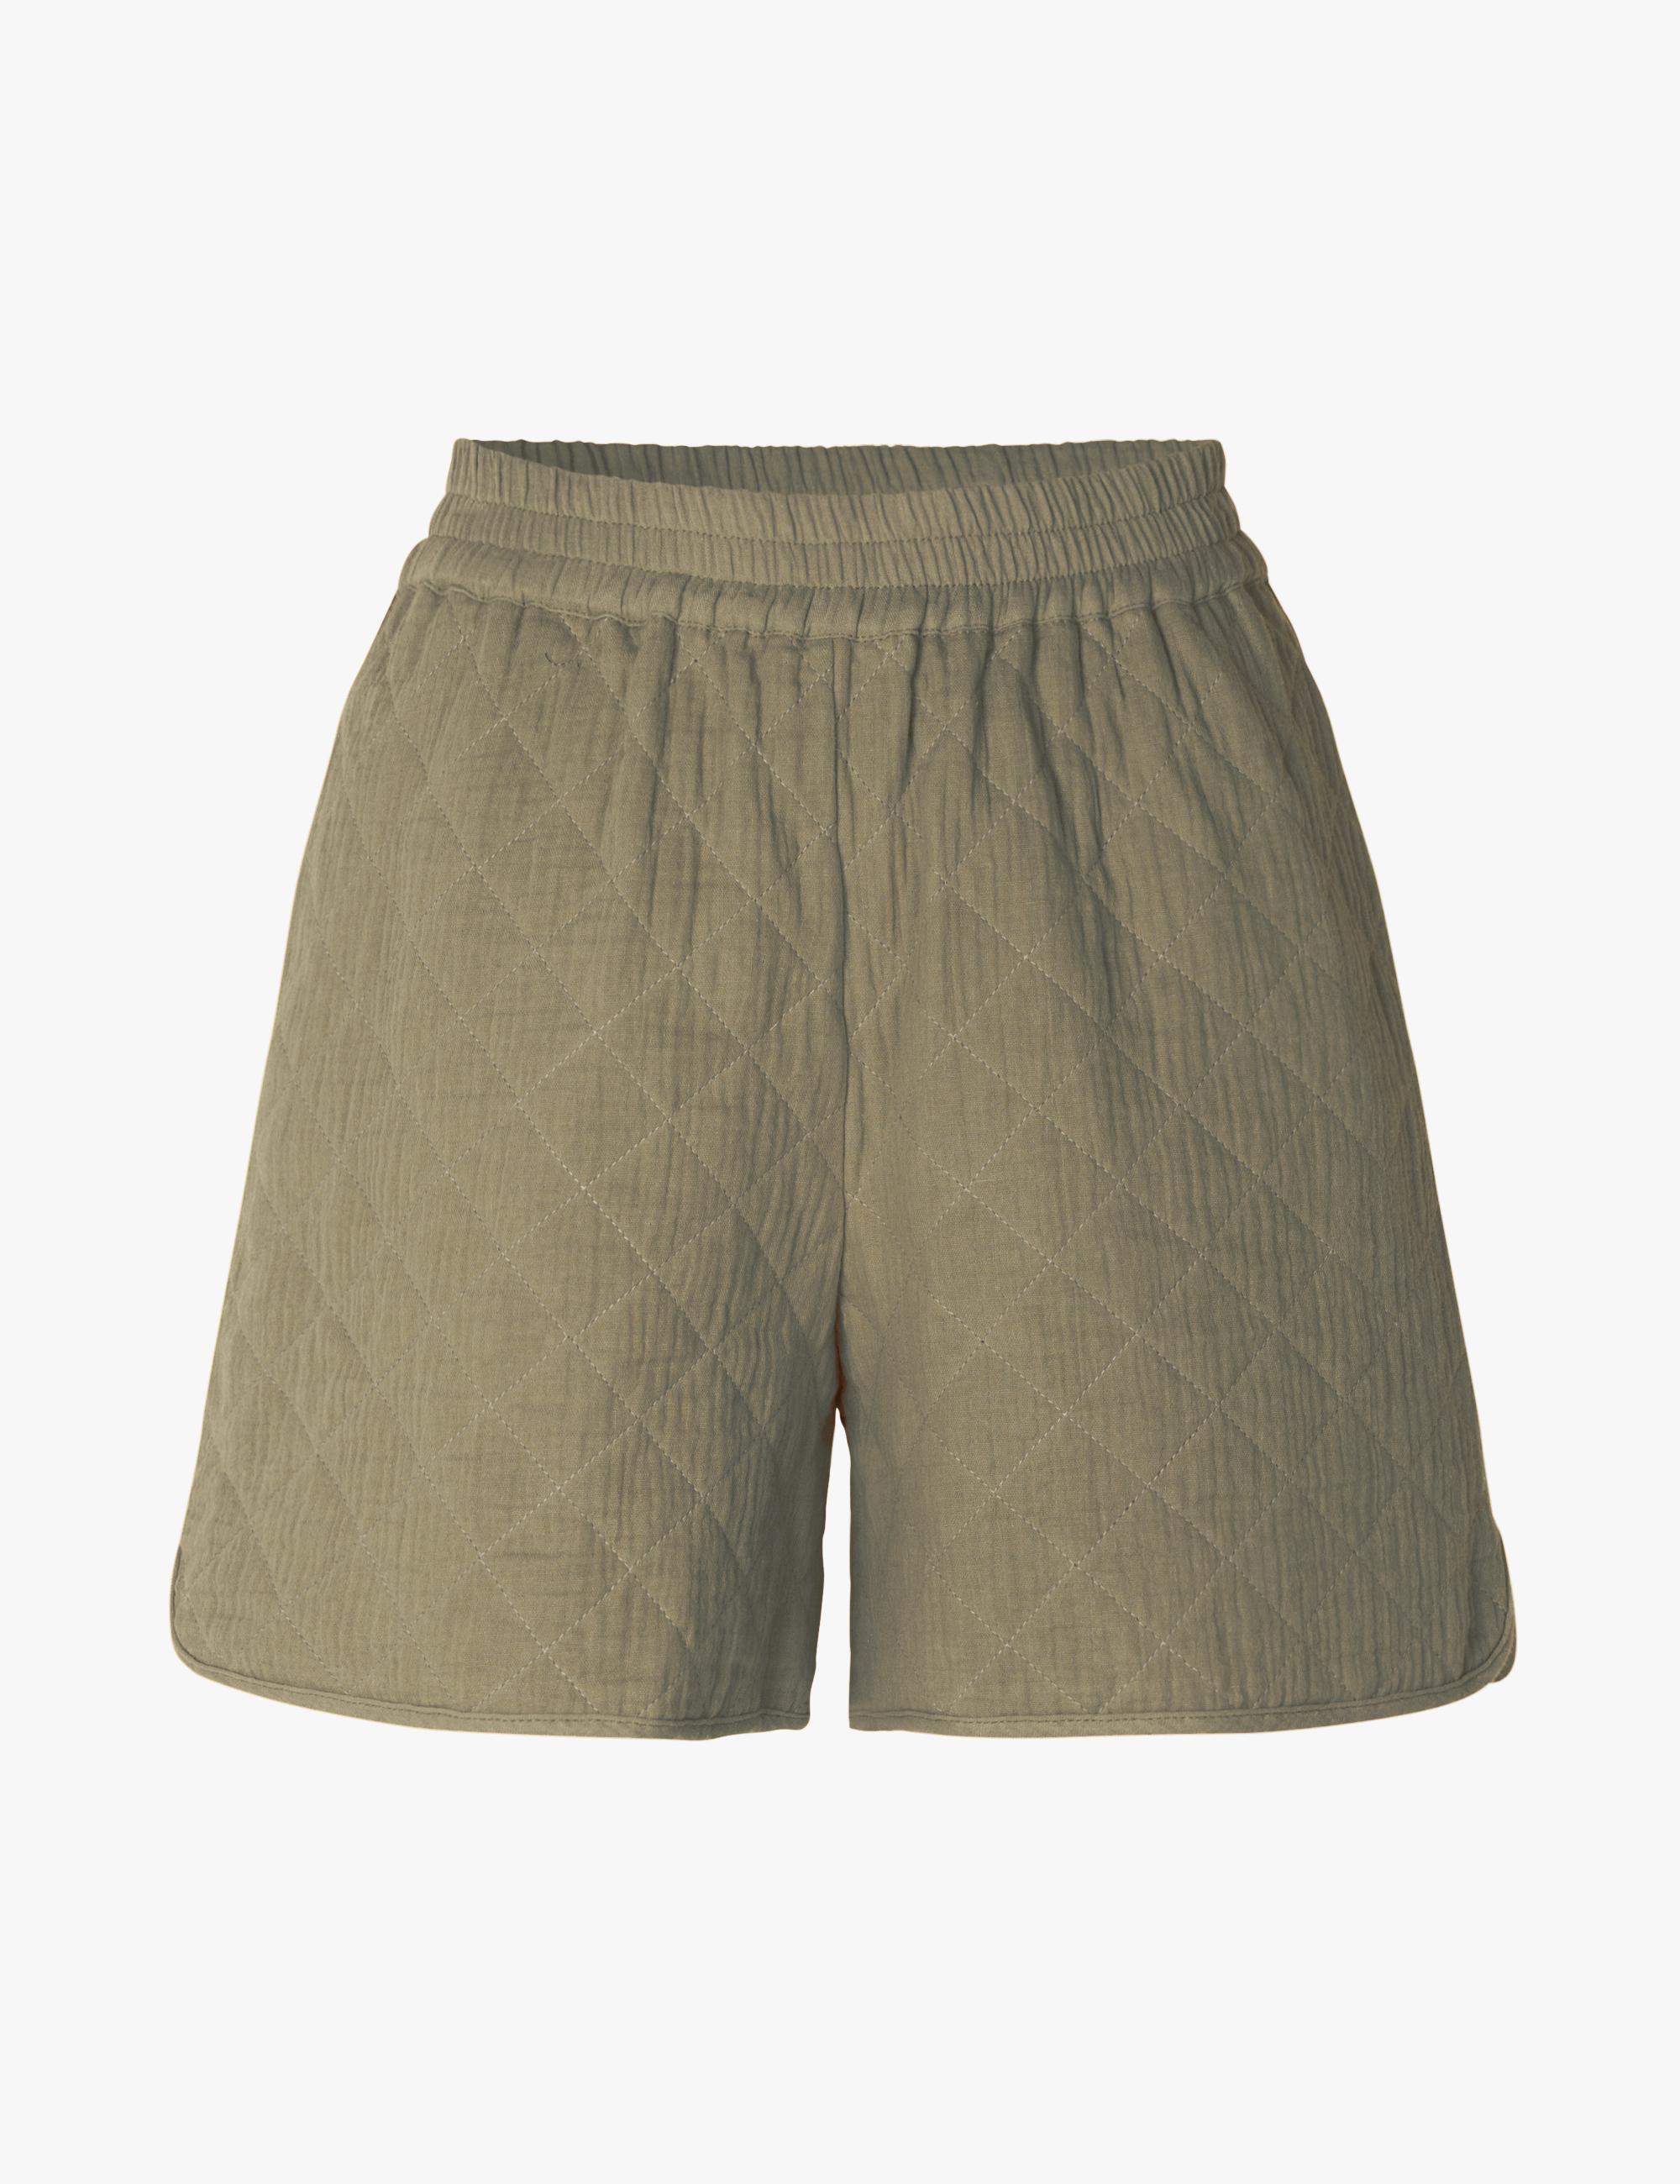 Global Funk Mosley shorts